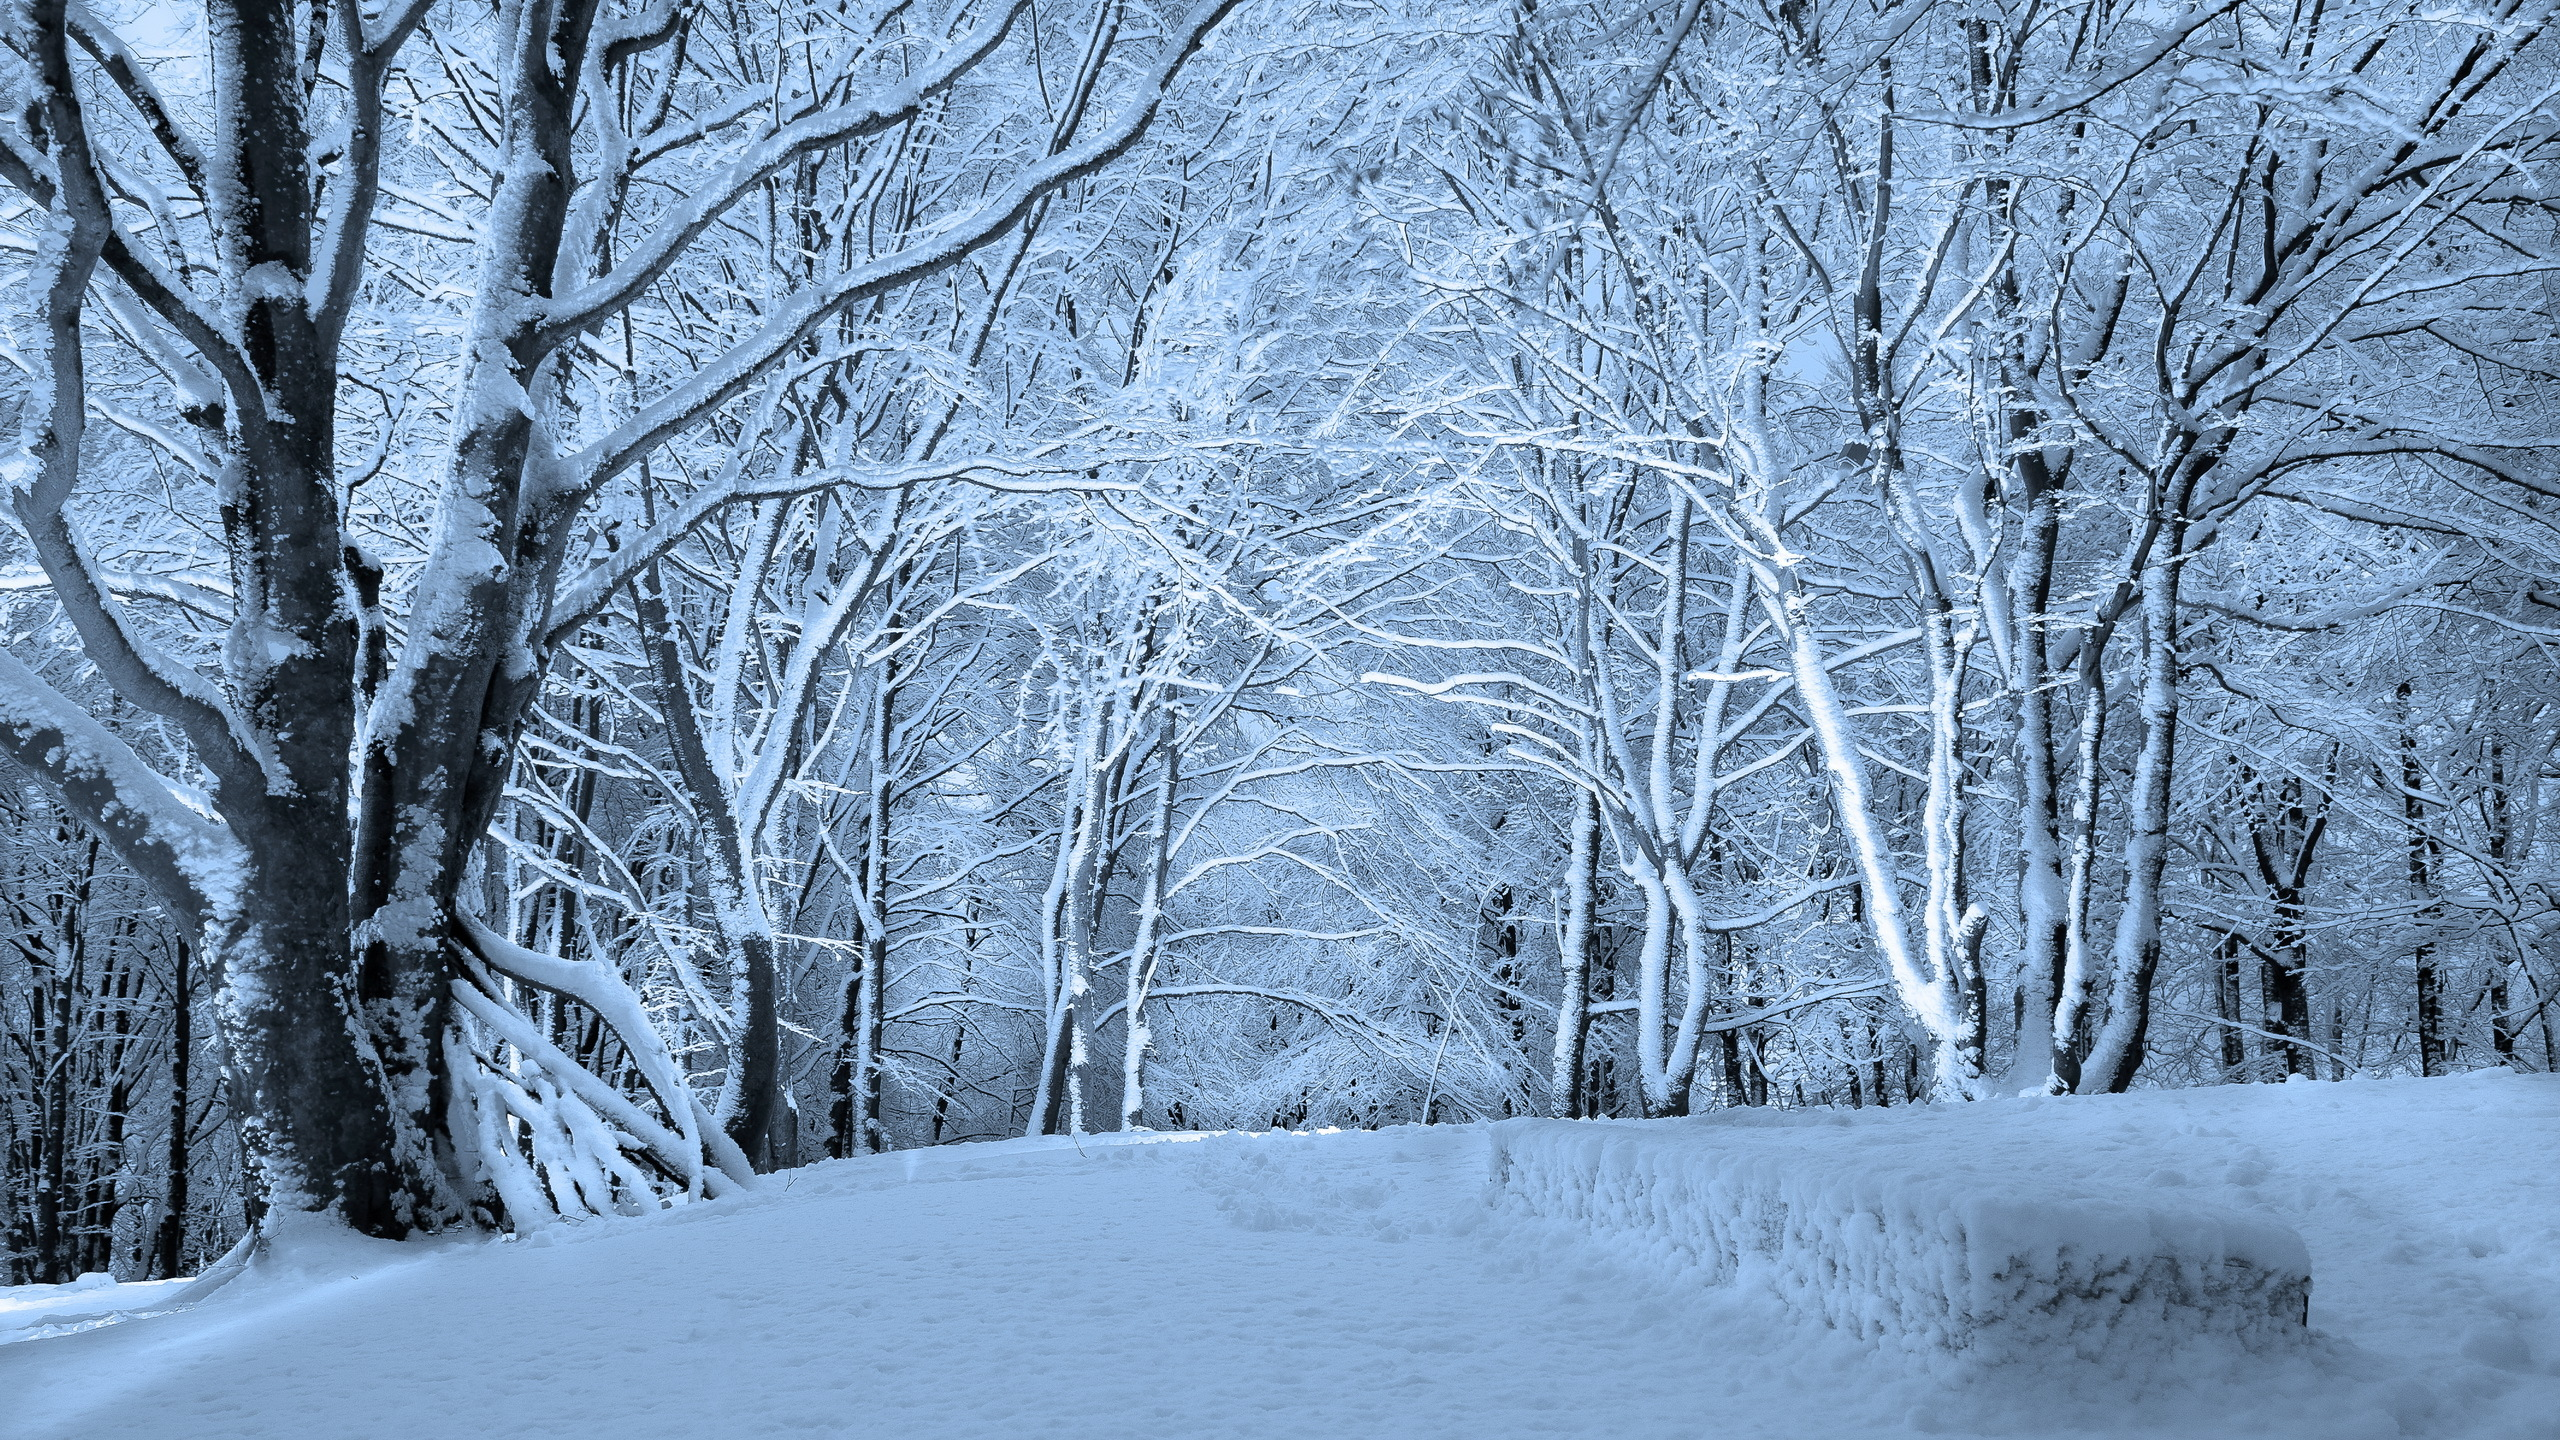 Free Download Wallpaper Winter Forest Hd Wallpaper